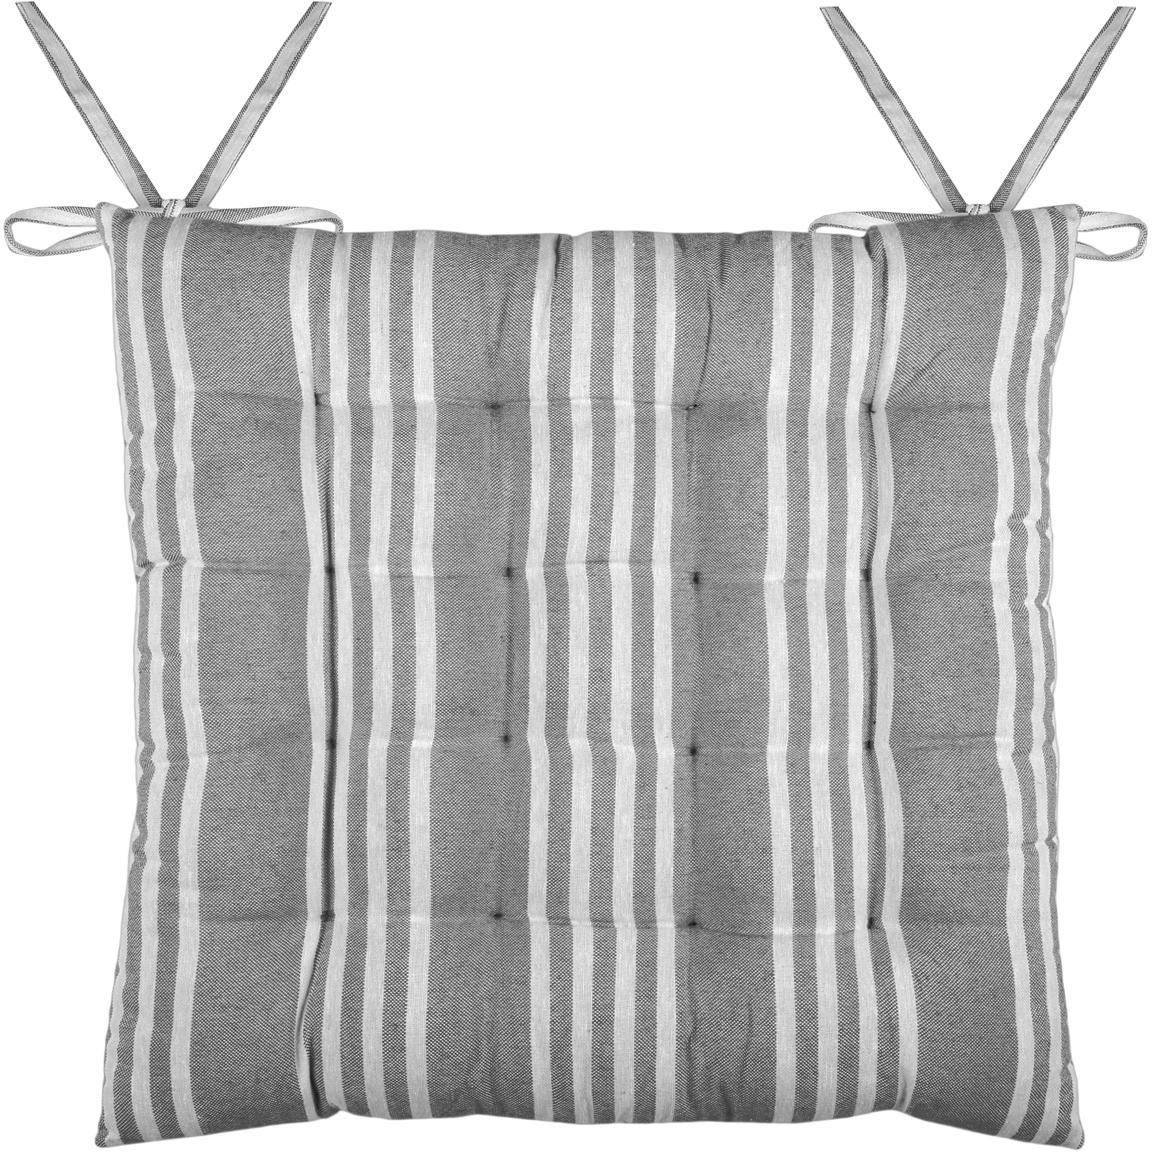 Cuscino sedia grigio Mandelieu, Cotone misto, Grigio scuro, bianco, Larg. 40 x Lung. 40 cm